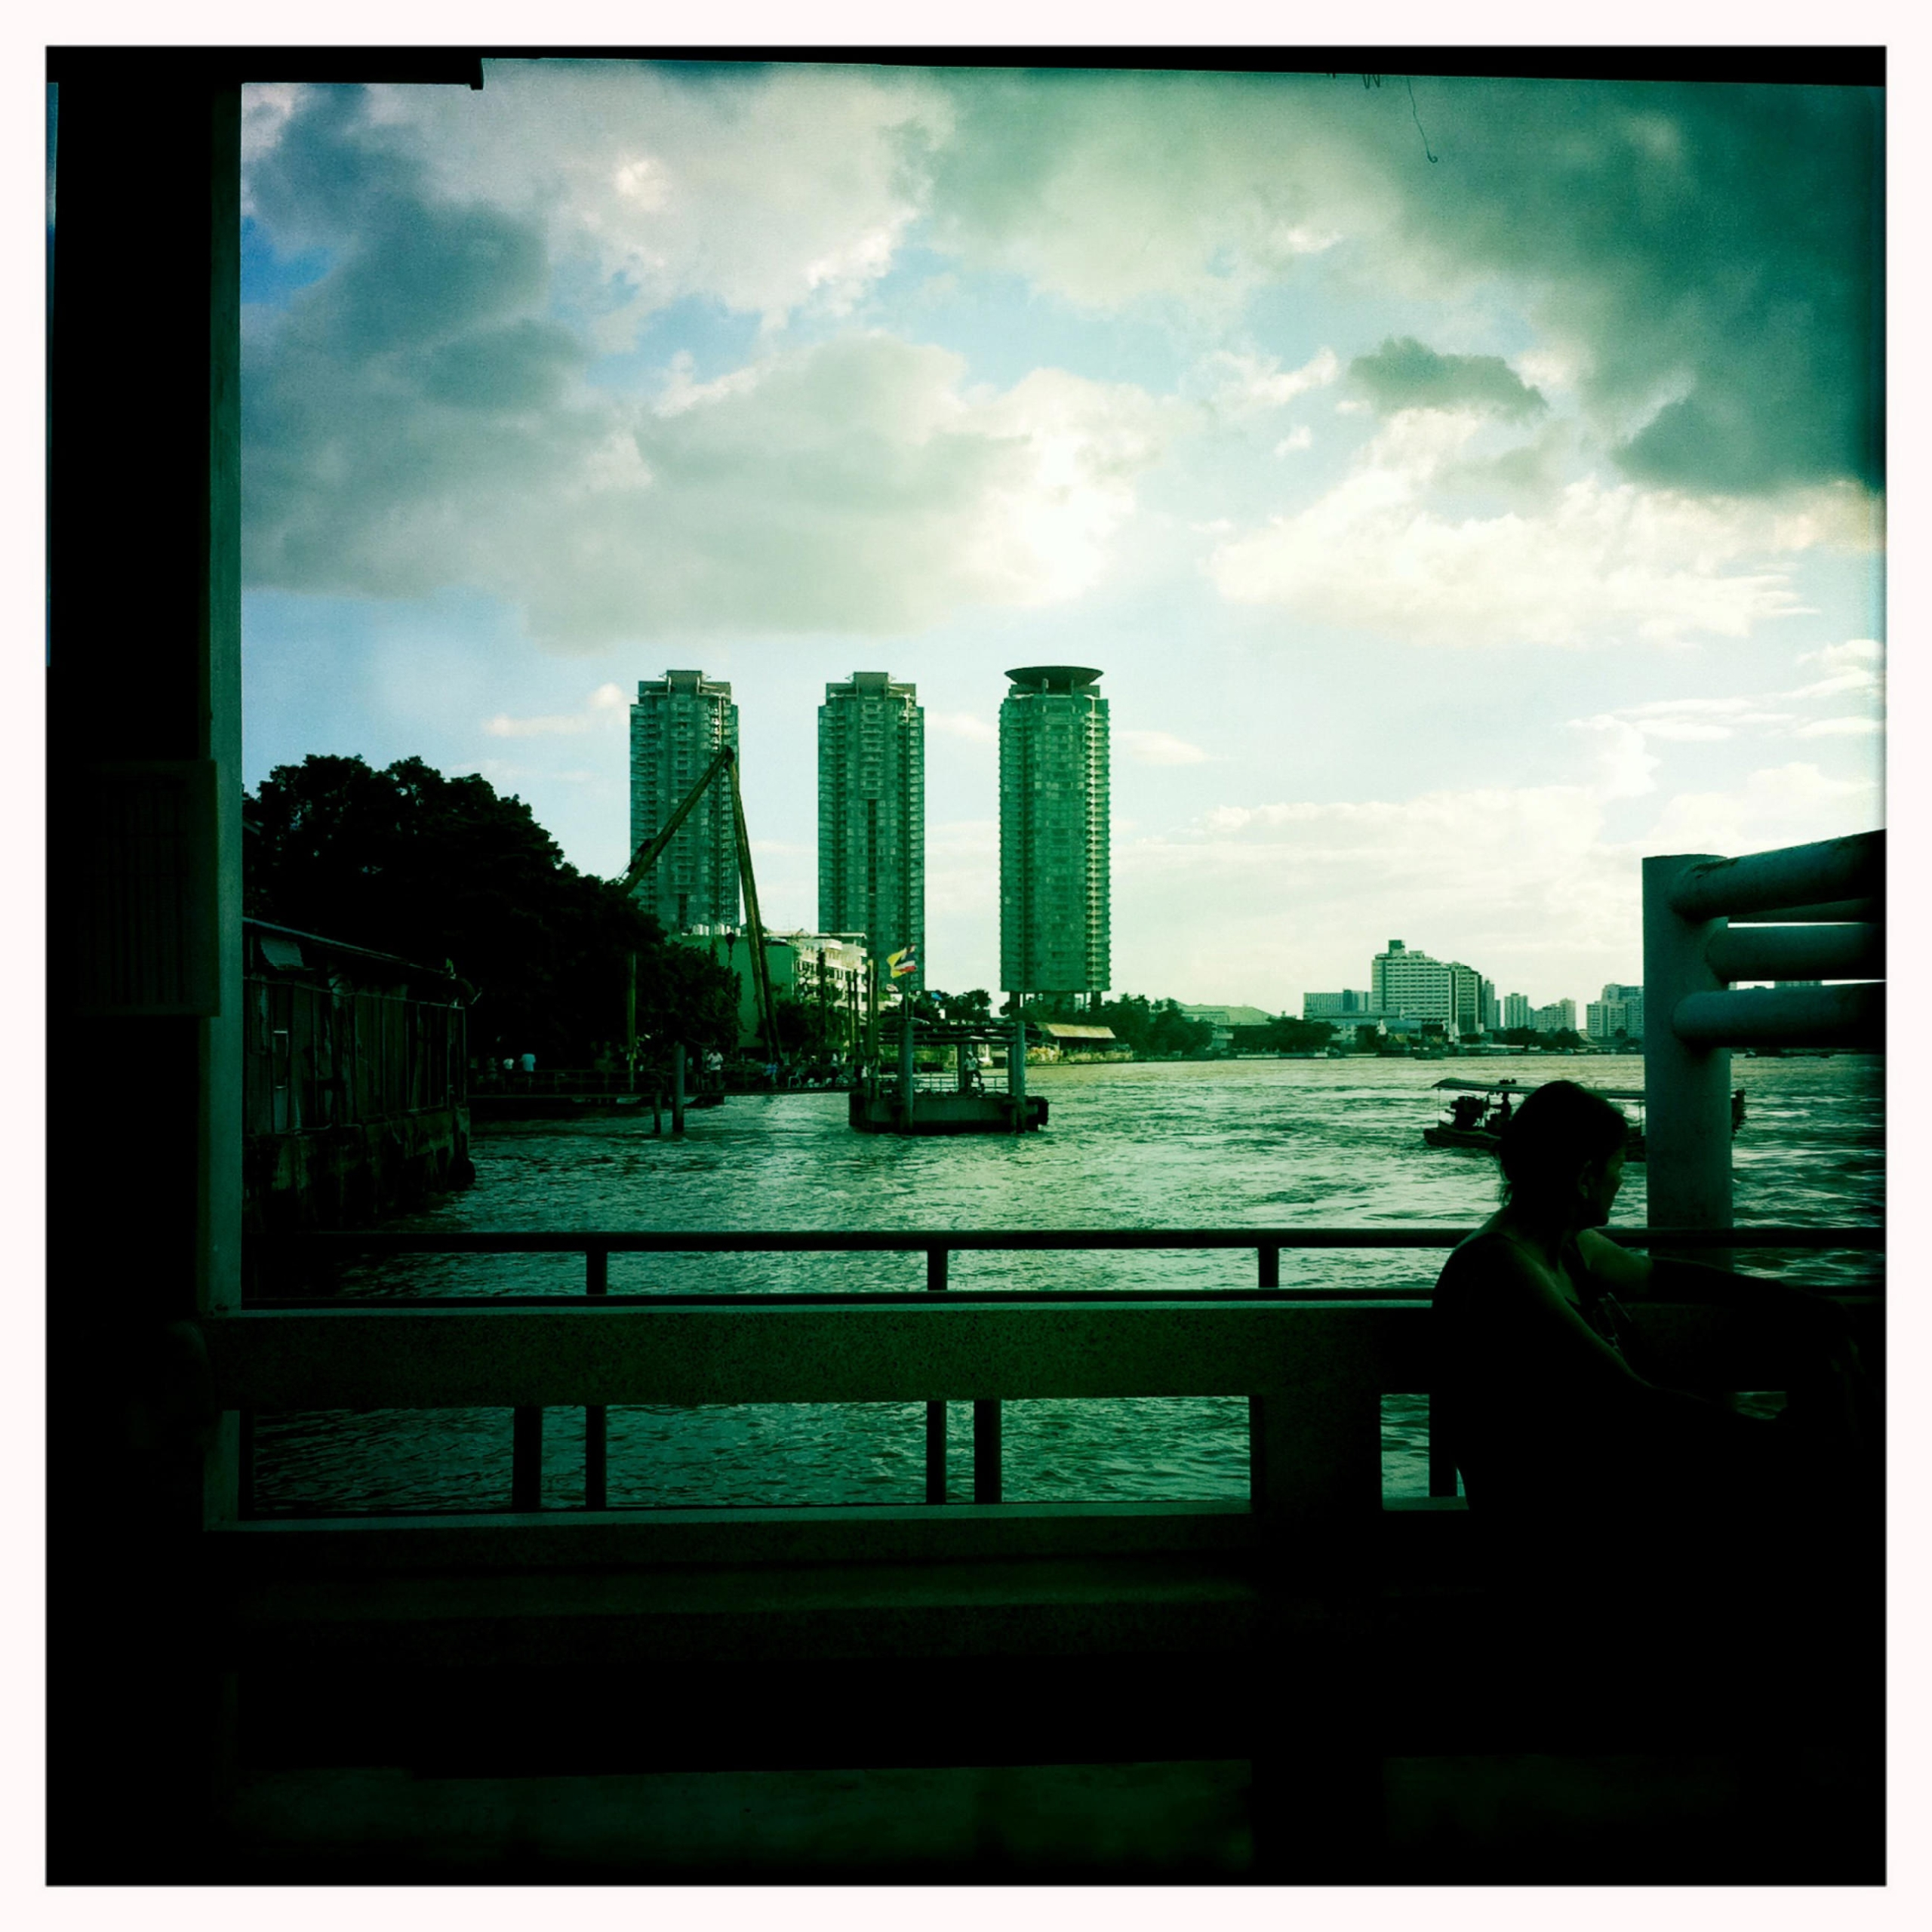 Farang - Photography, Architecture - marcomariosimonetti | ello